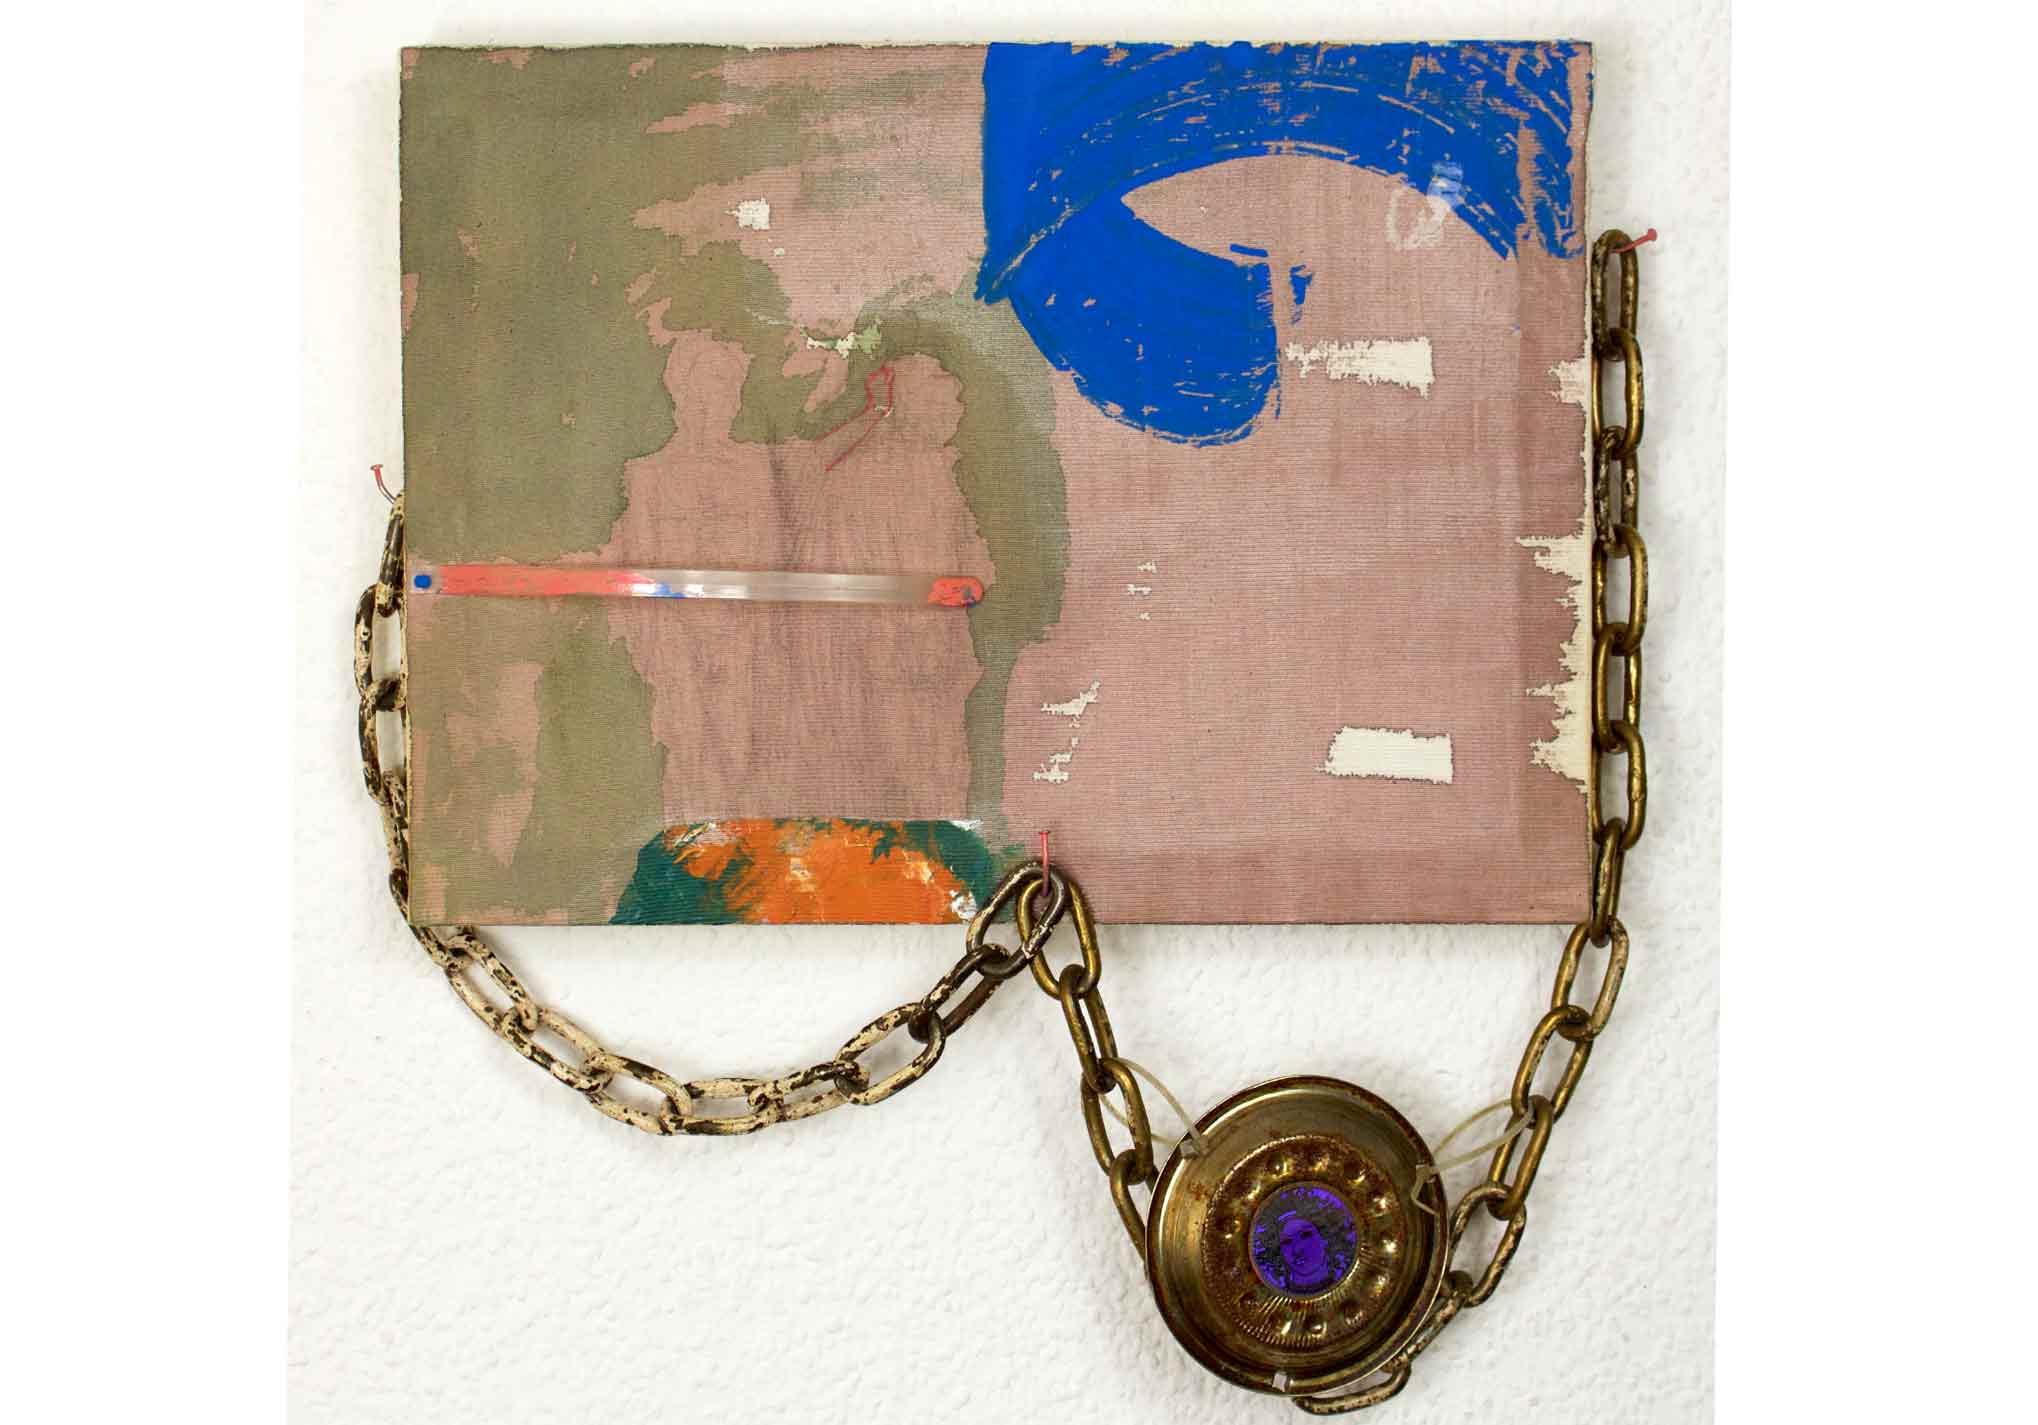 MT-Galerie-Zygmunt-Blazejewski-MEGS_Super-Symbio_17-009